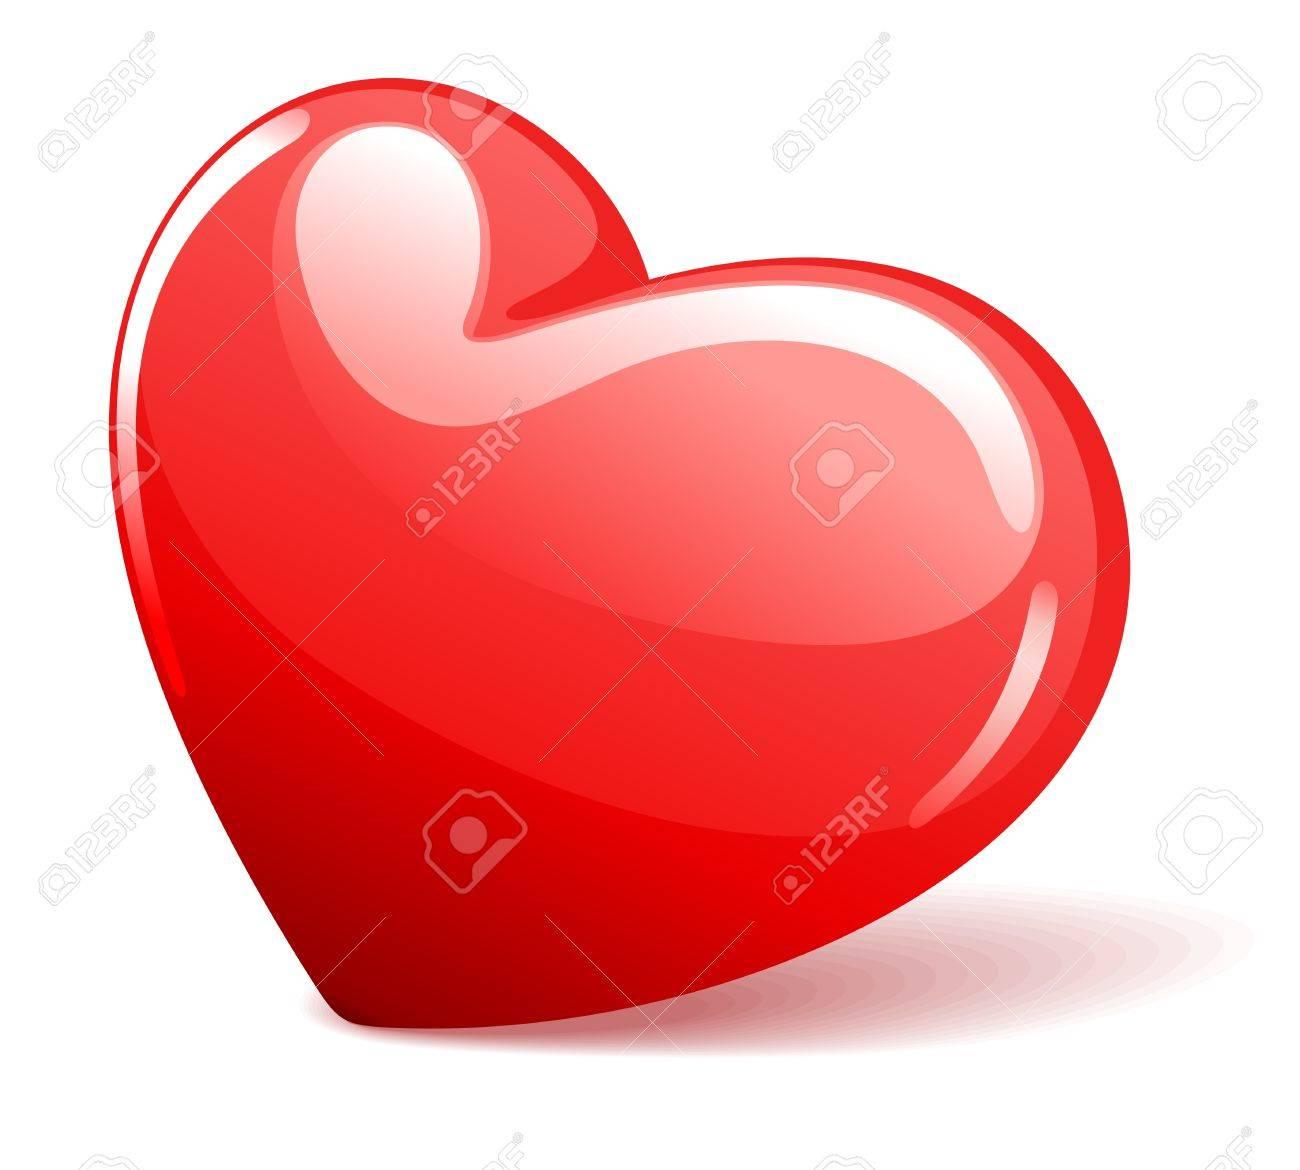 Red heart illustration Stock Vector - 11324343